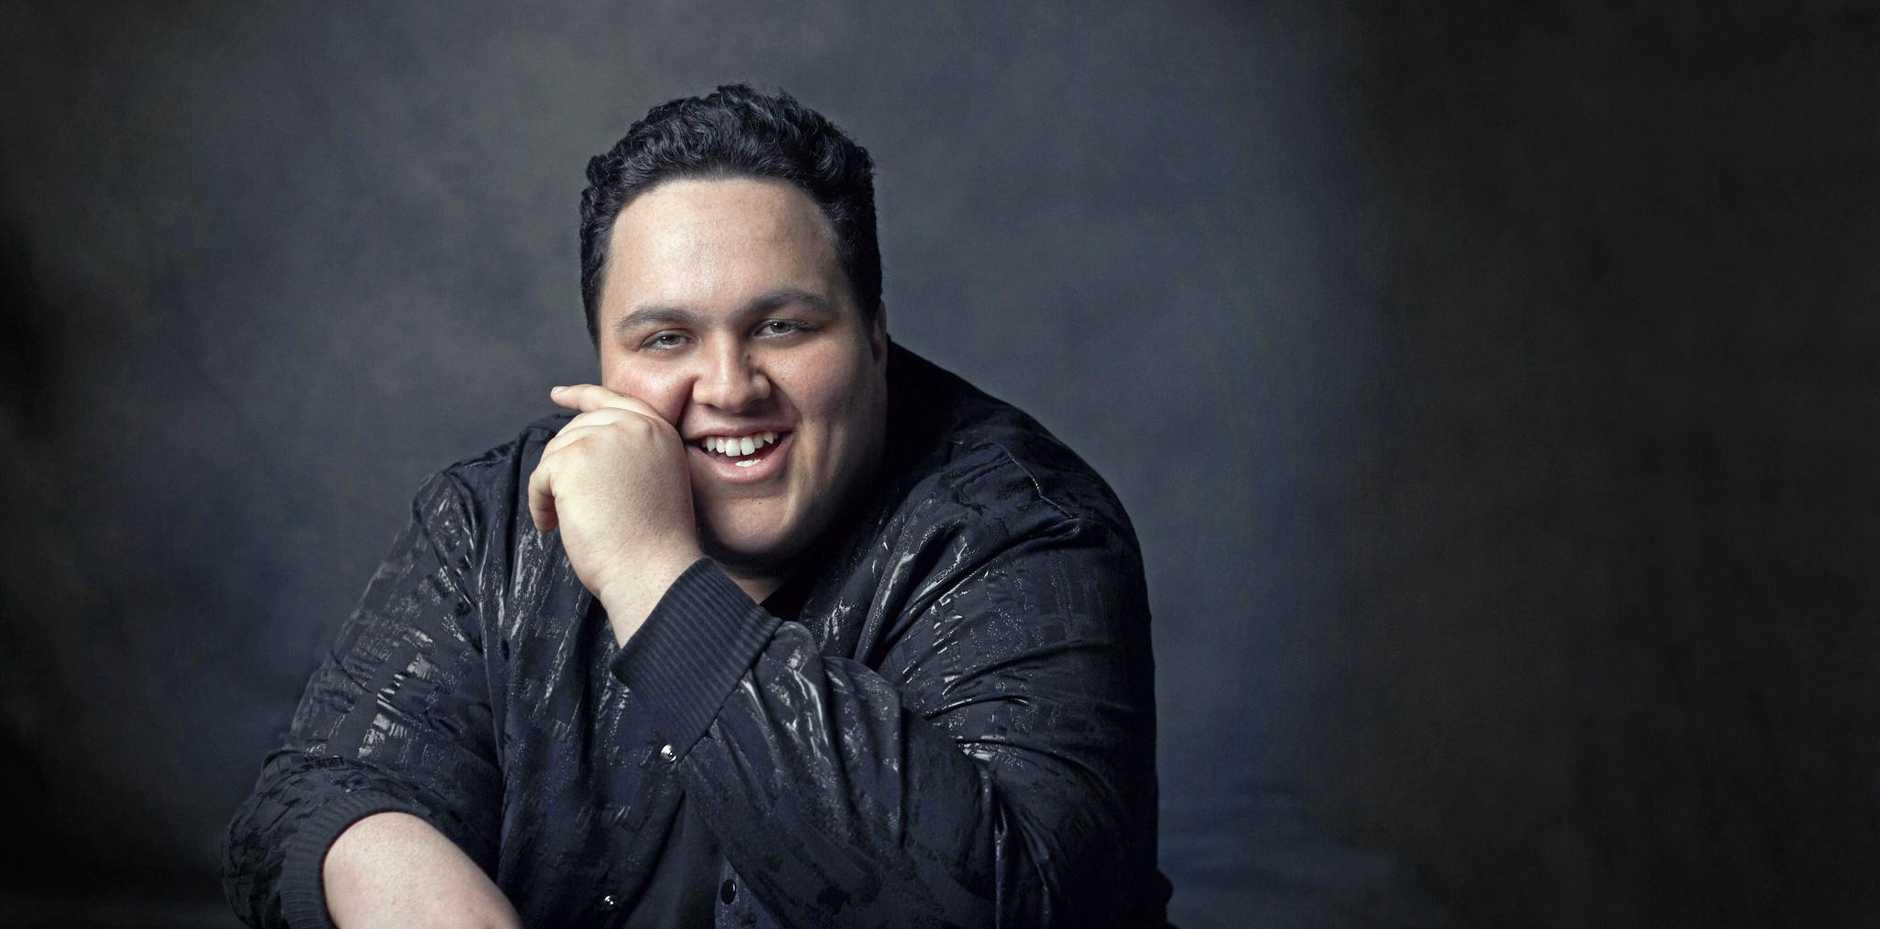 The Voice winner Judah Kelly had enjoyed chart success.